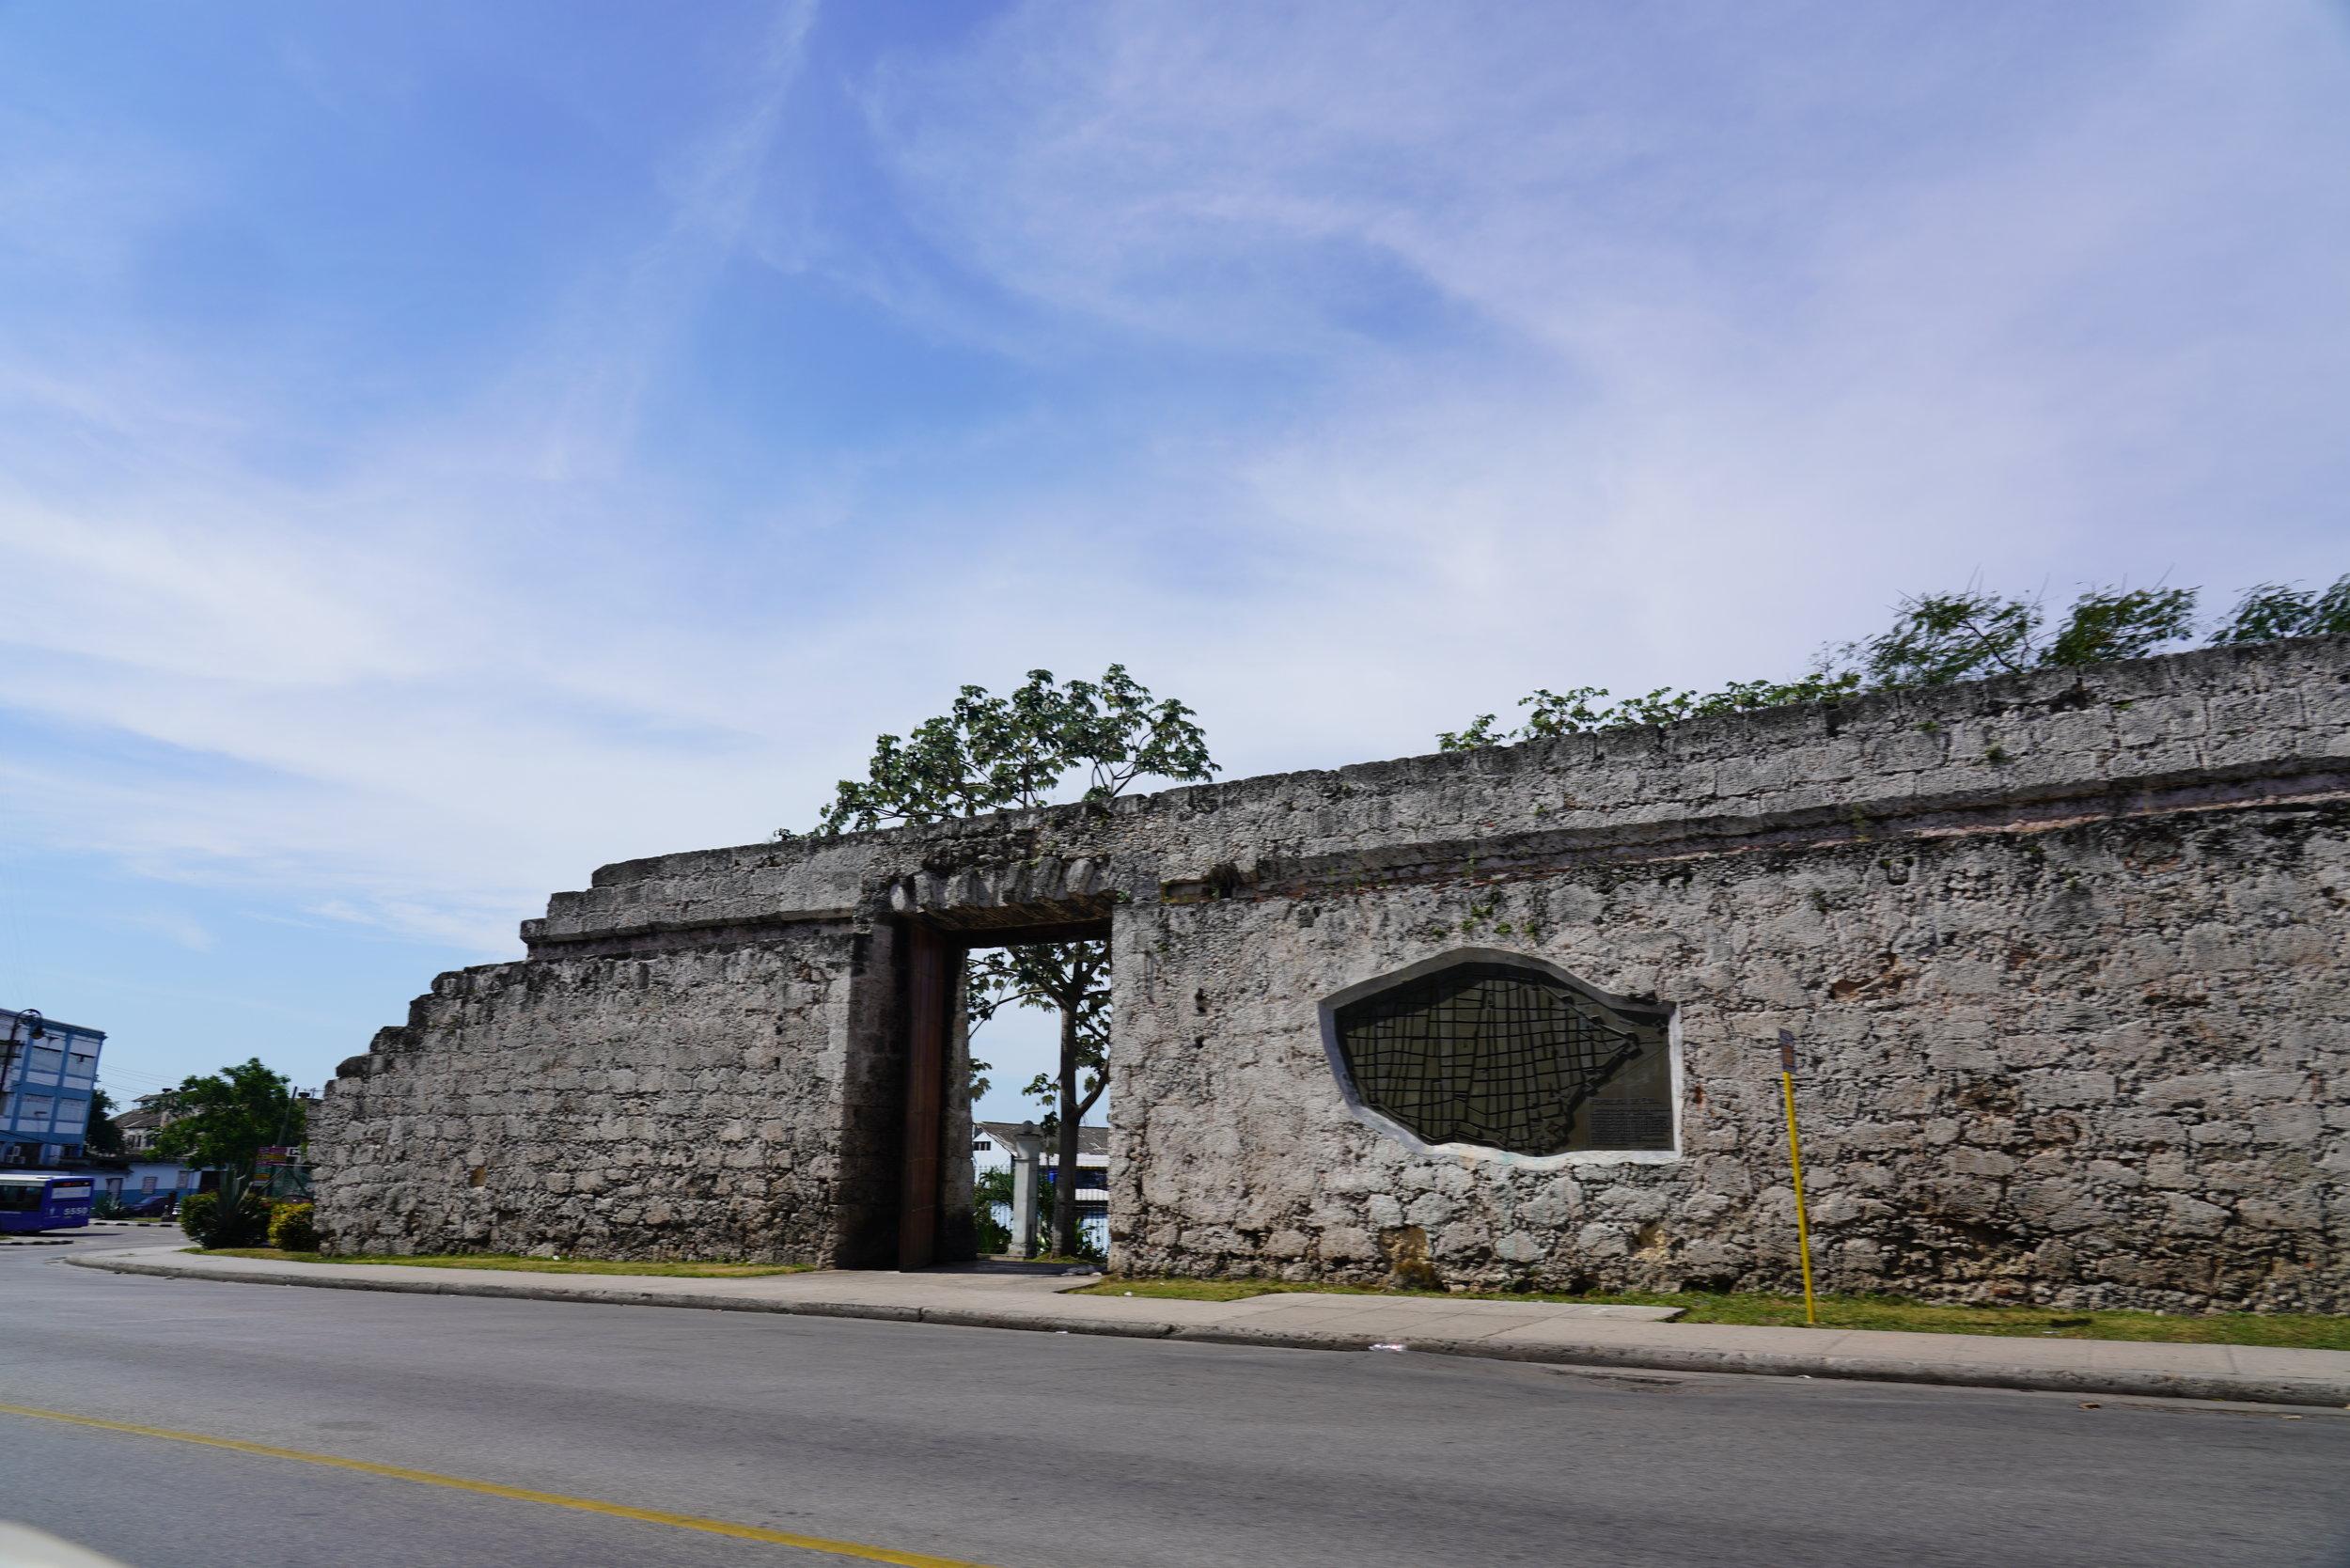 Ruina do Muro em Havana, Cuba